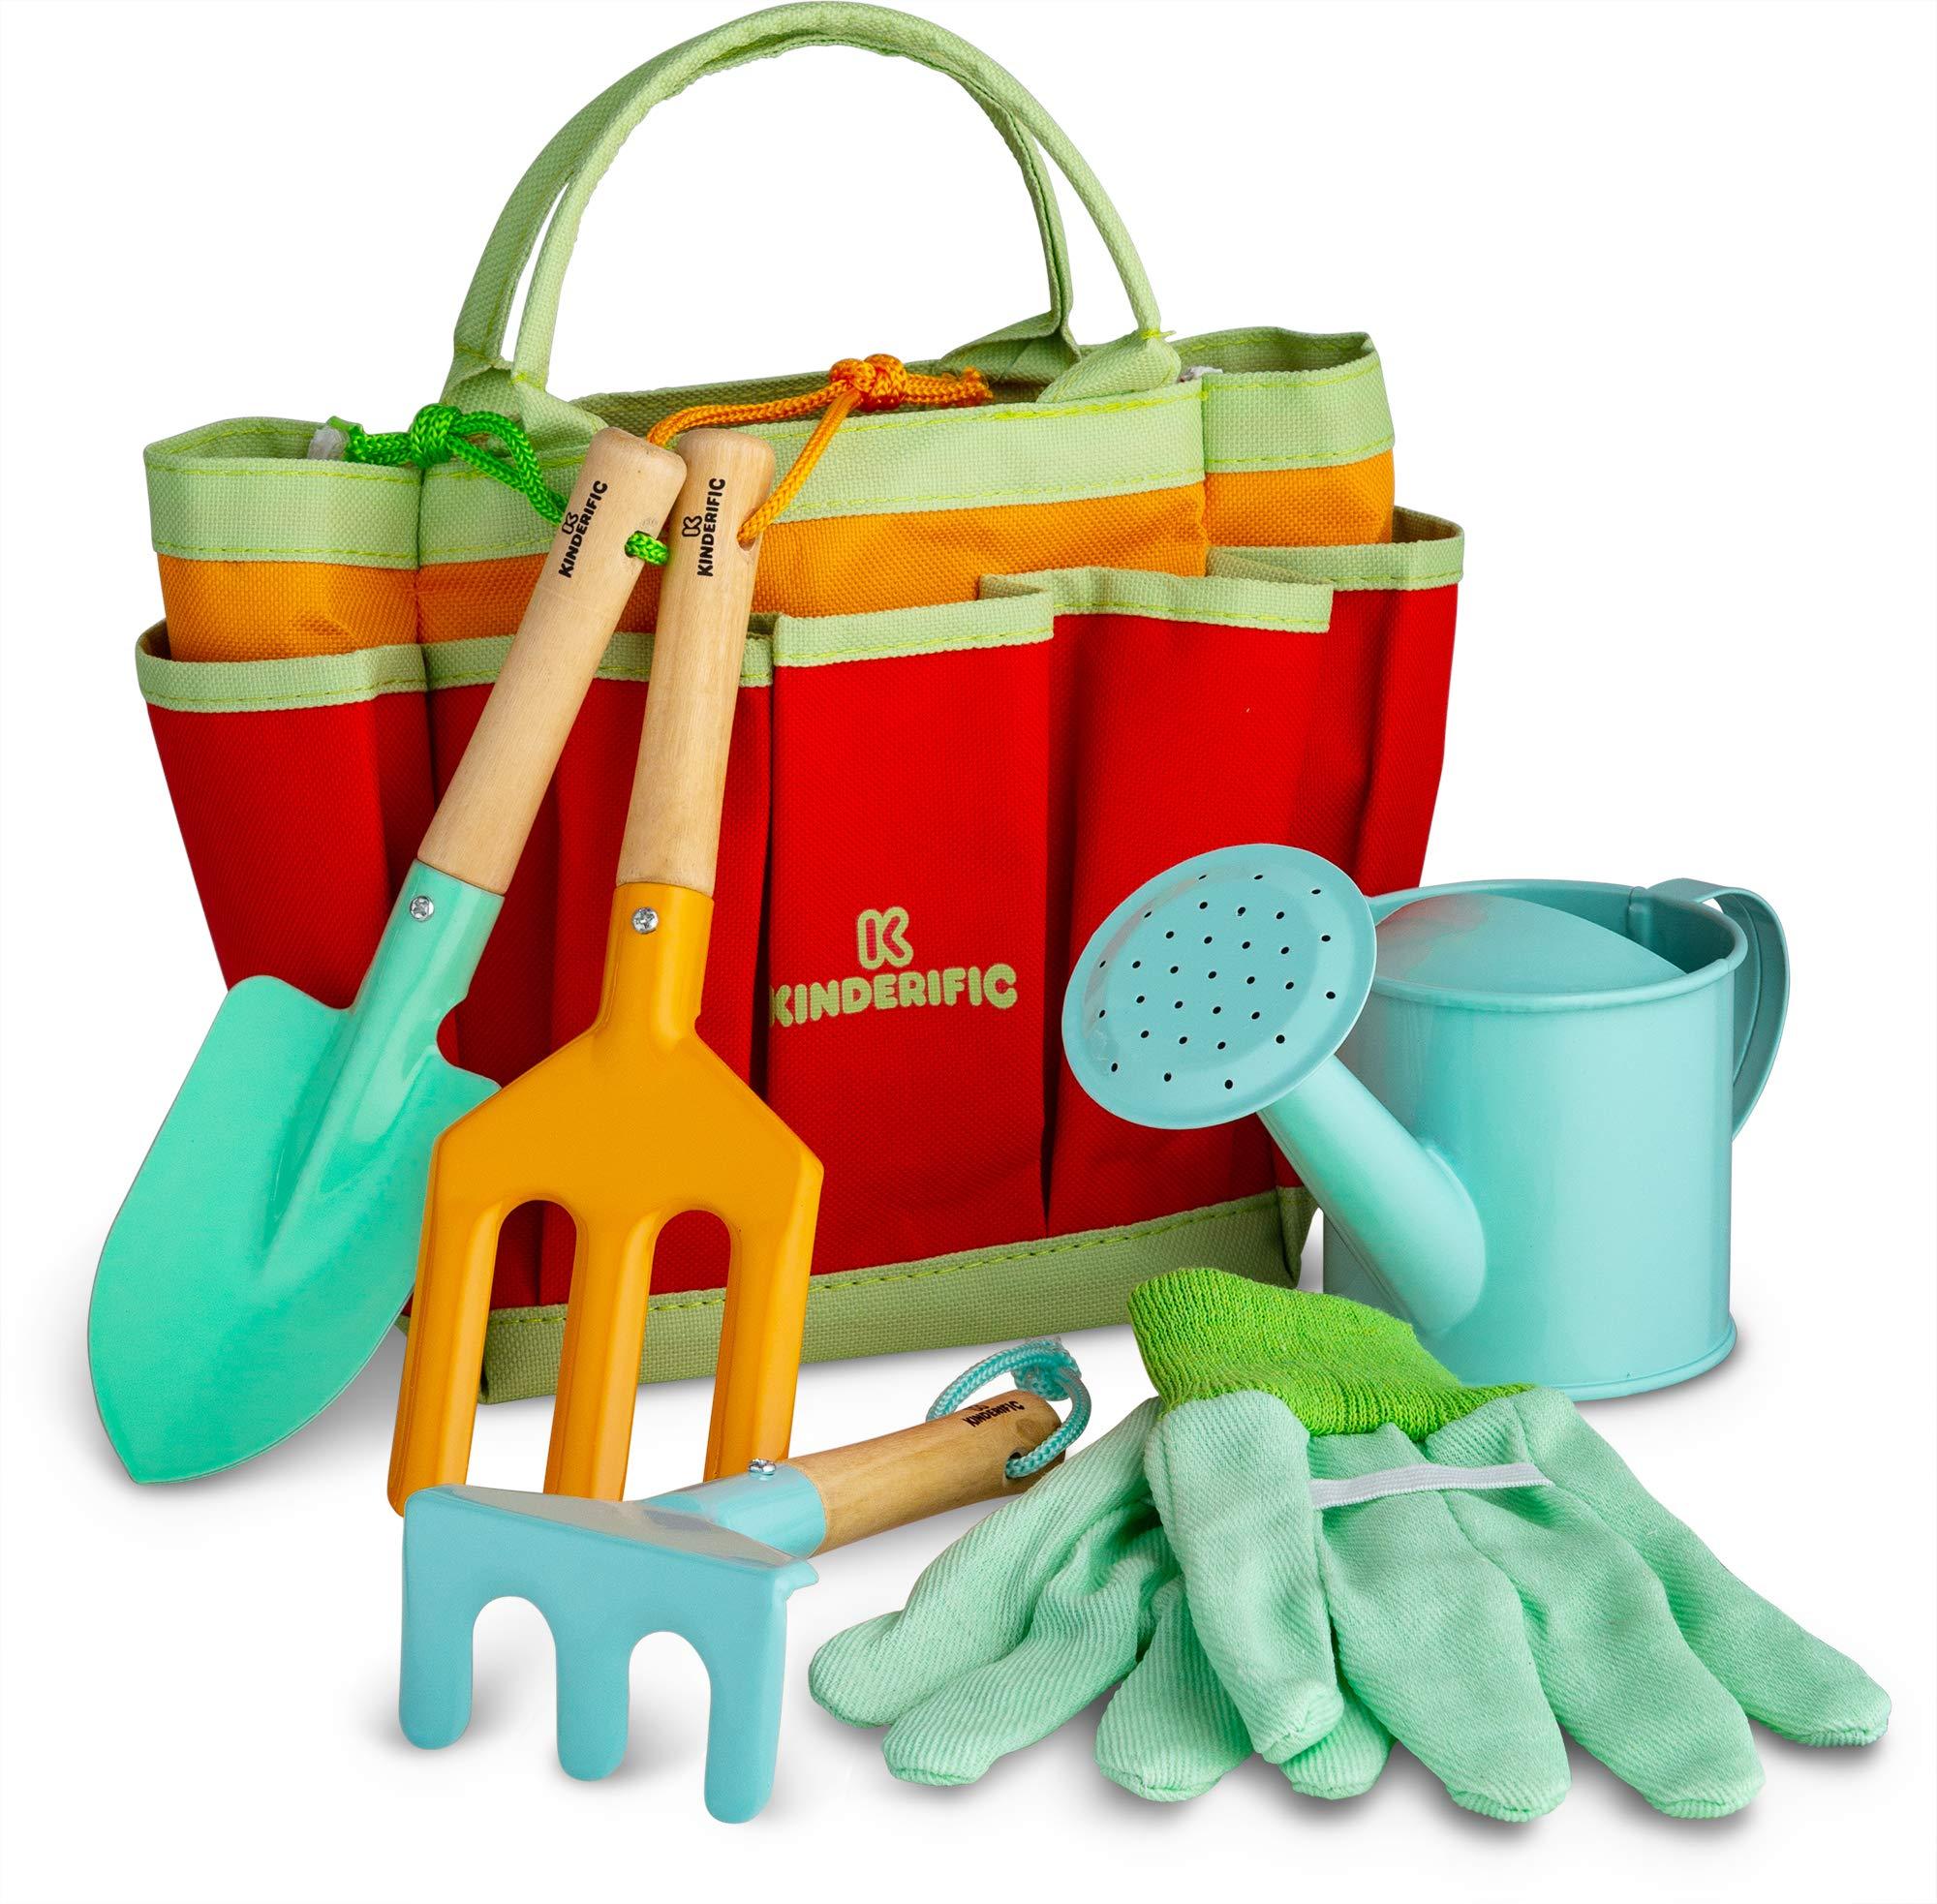 Kinderific Gardening Tool Set, Designed for Kids, STEM, Tote Bag, Spade, Watering Can, Rake, Fork, Trowel, Gloves.